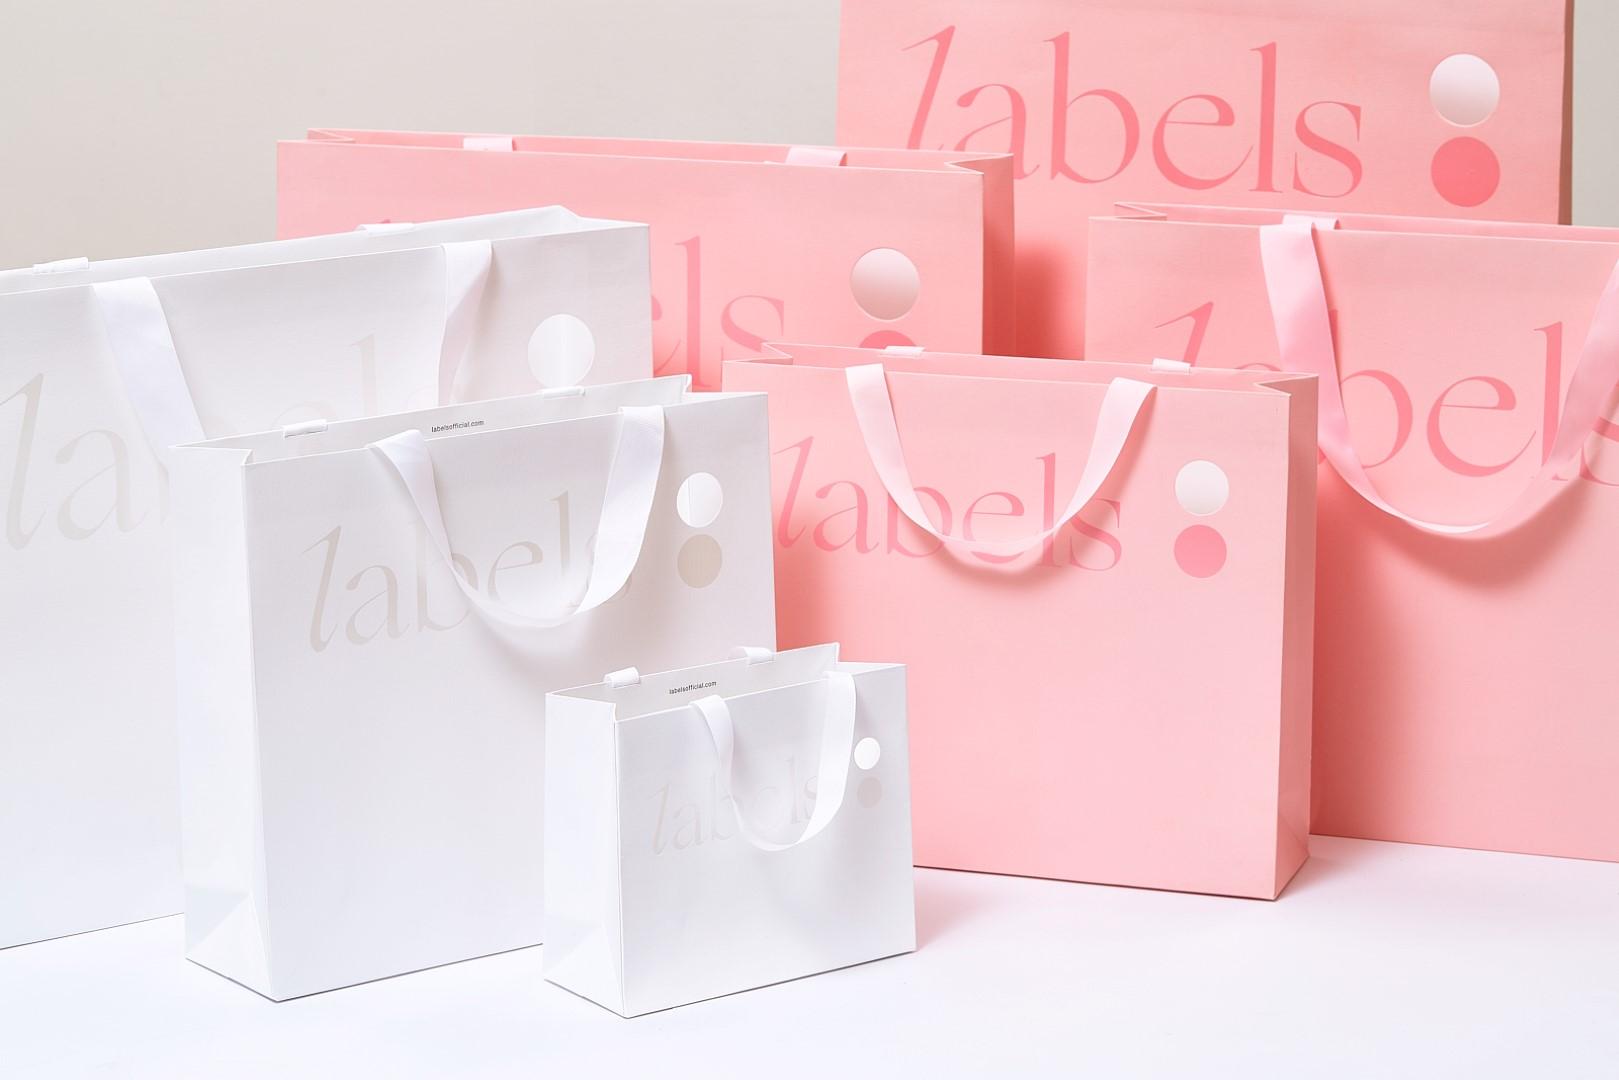 M — N Associates – labels